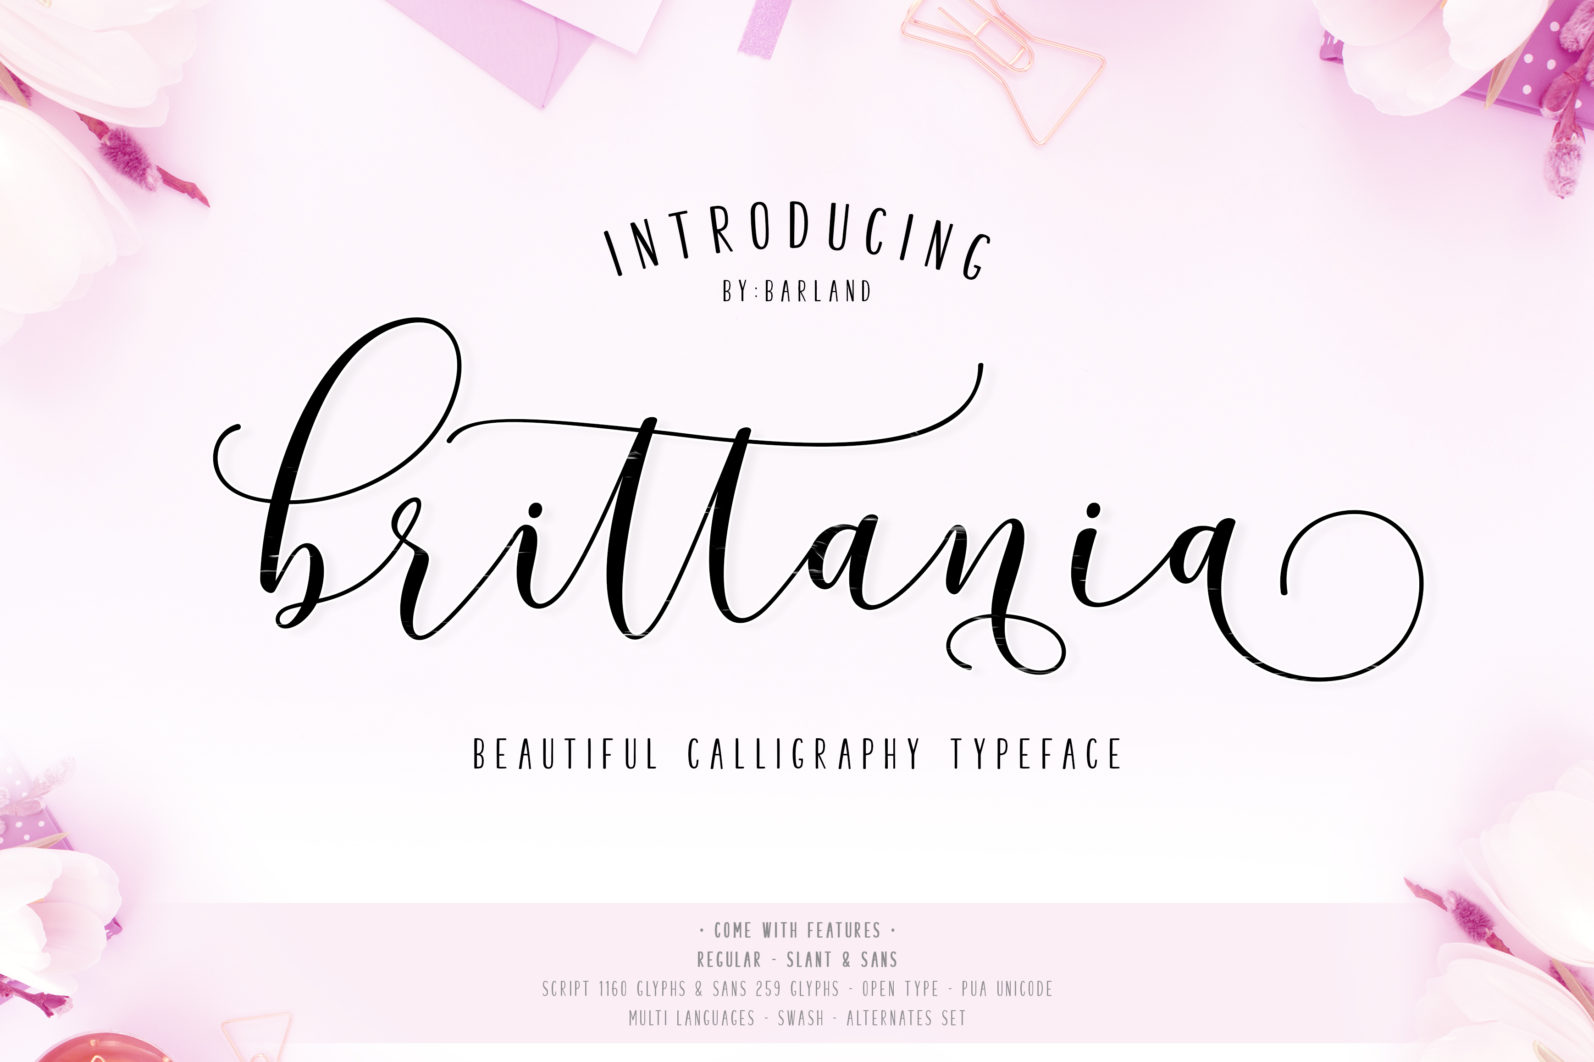 BIG PACKAGE - Font Bundle - 90% Off - 14 Brittania Script scaled -